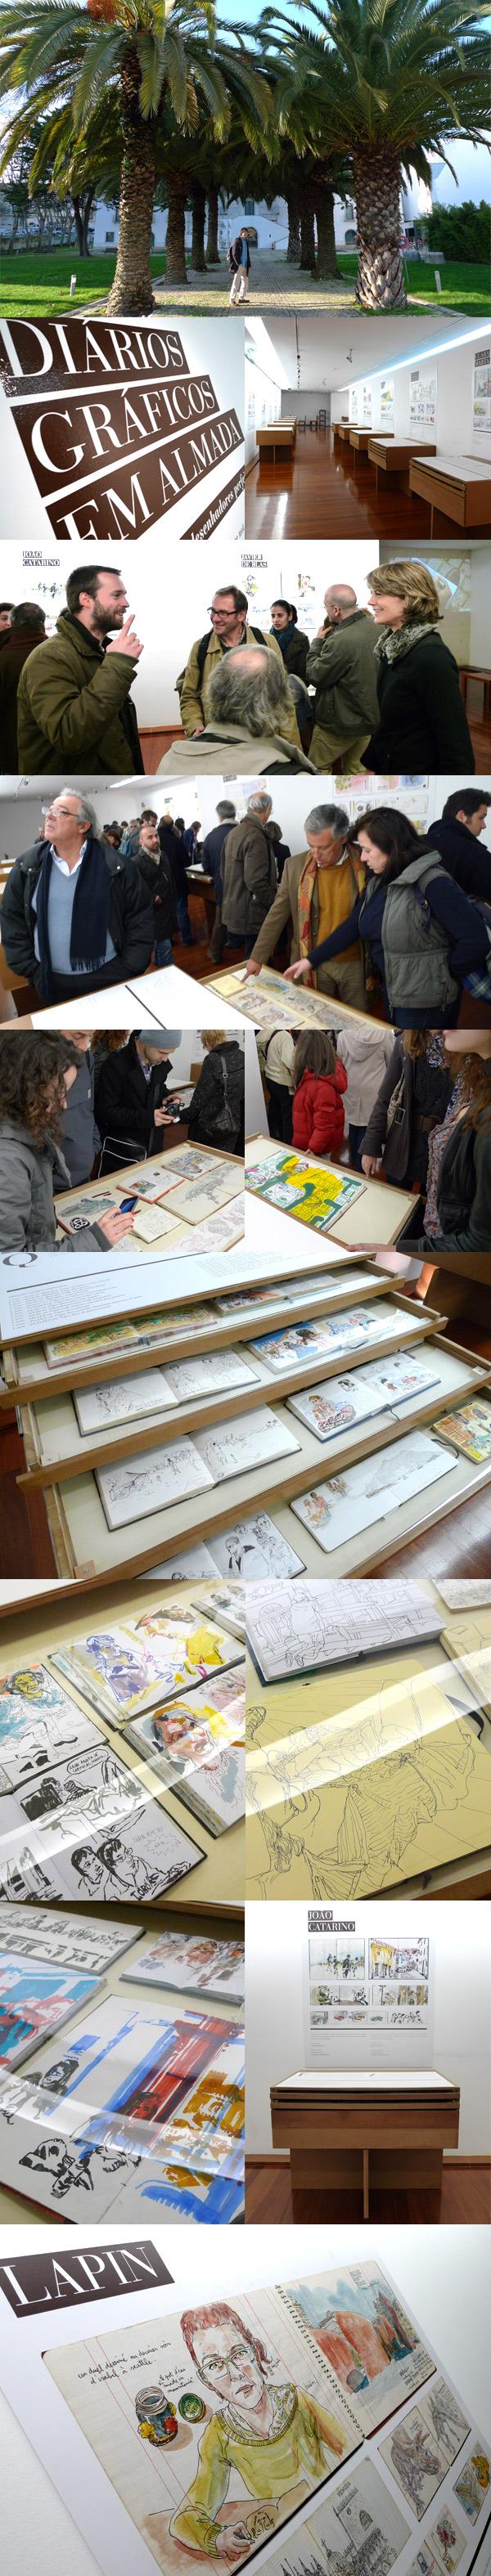 diarios graficos em almada - exhibition